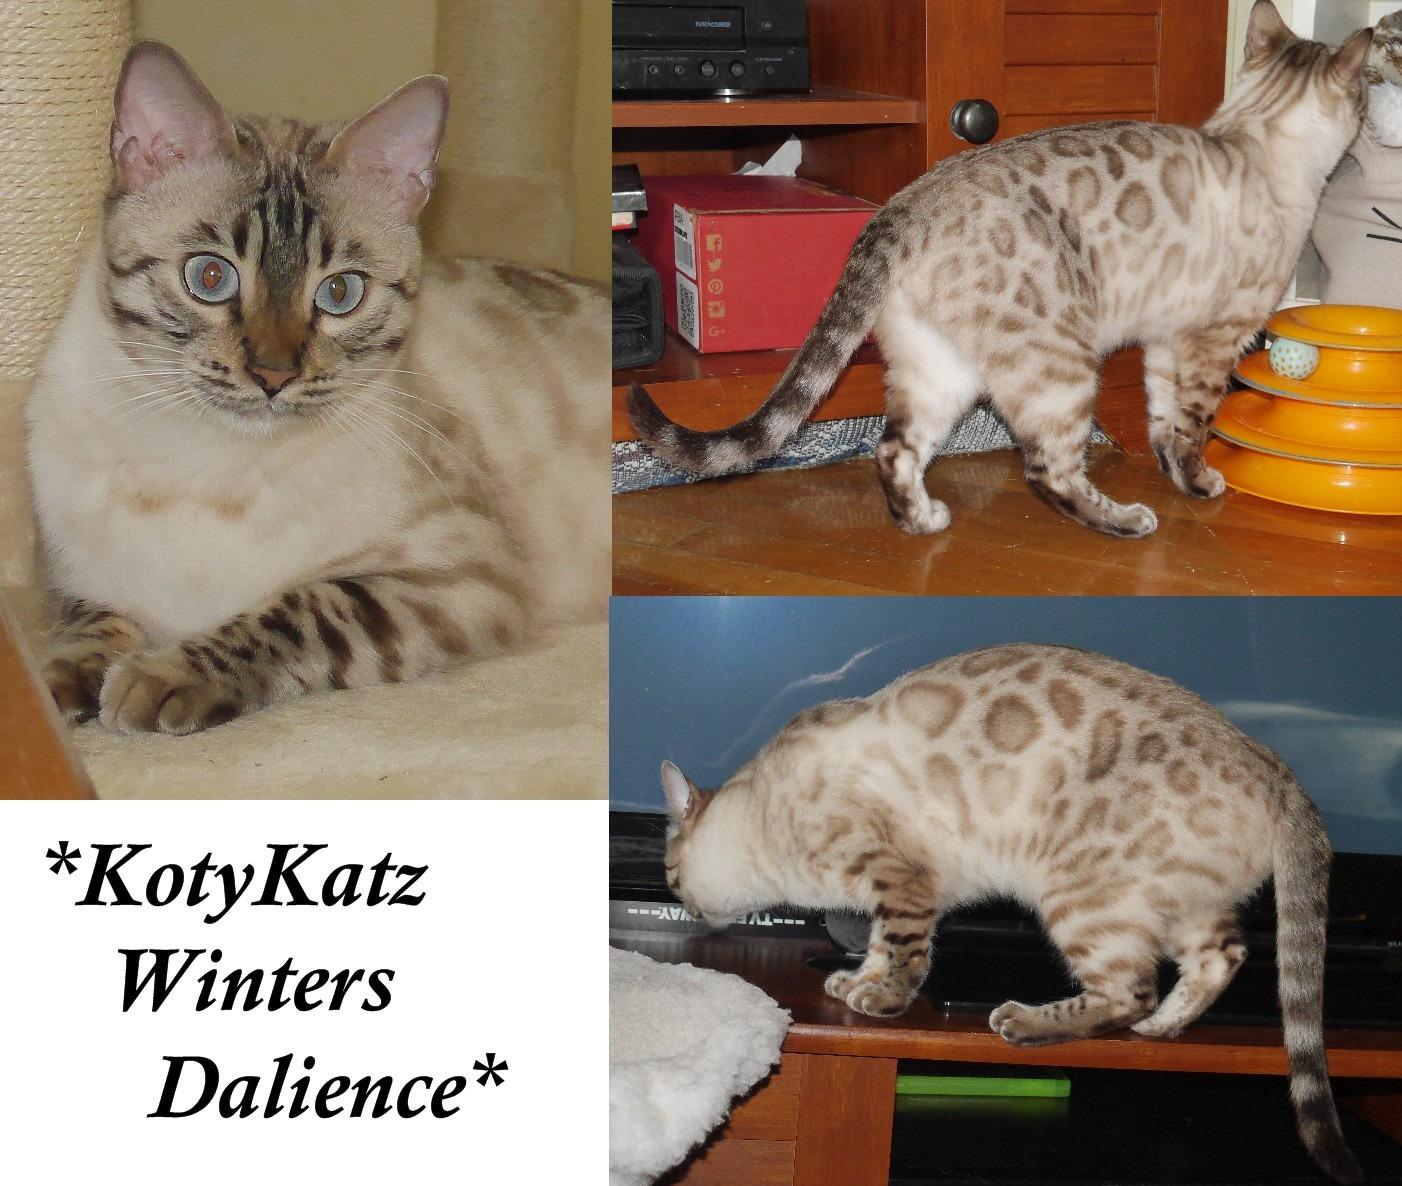 KotyKatz Winters Dalience